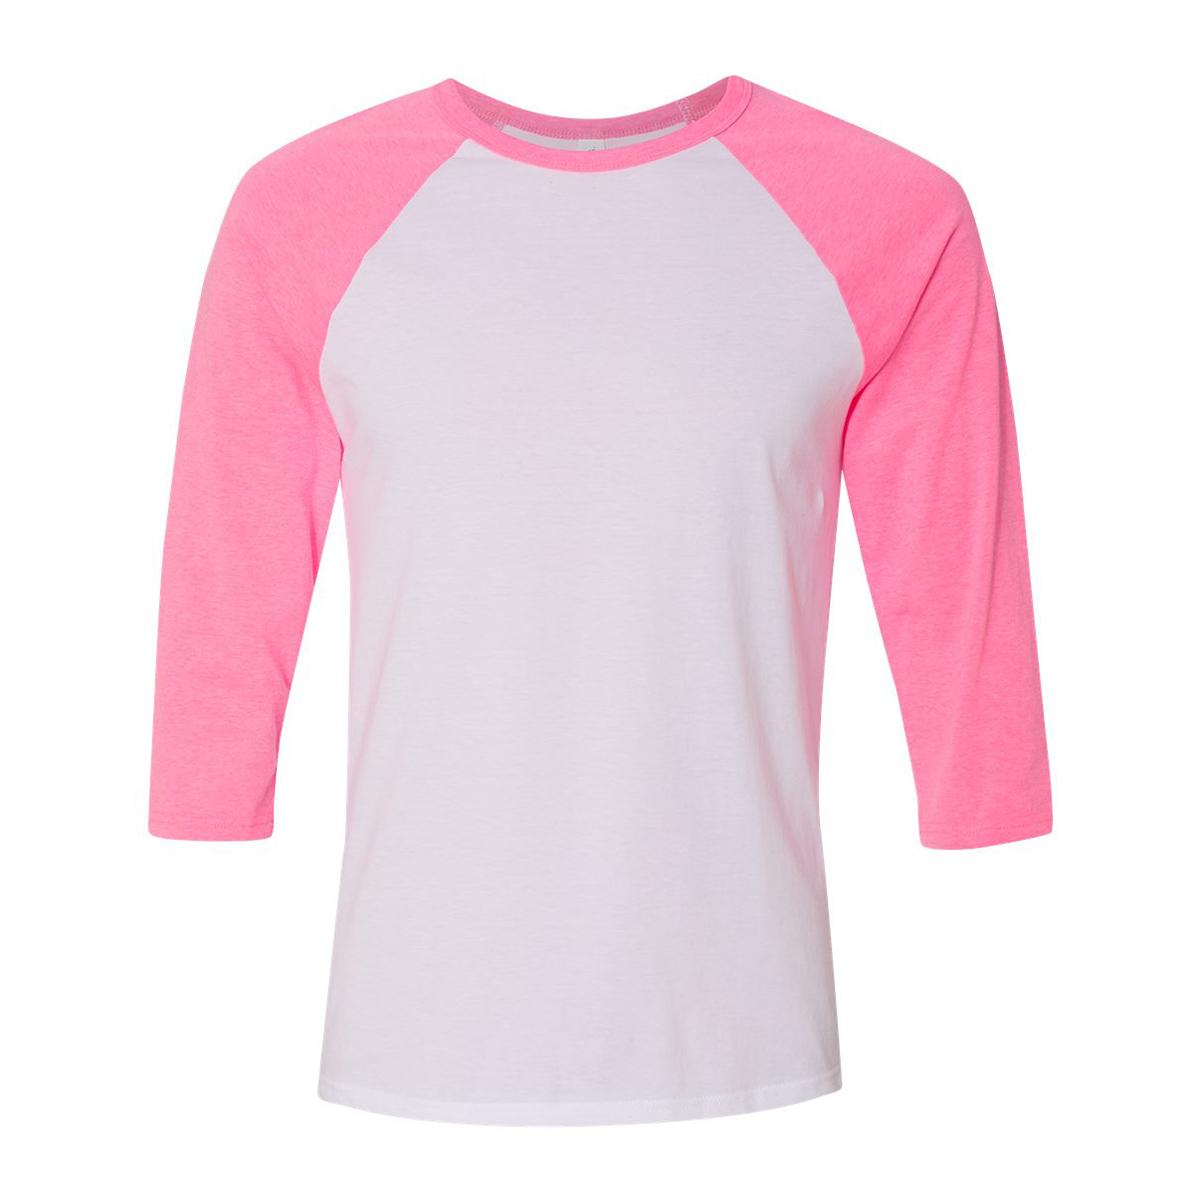 White neon pink